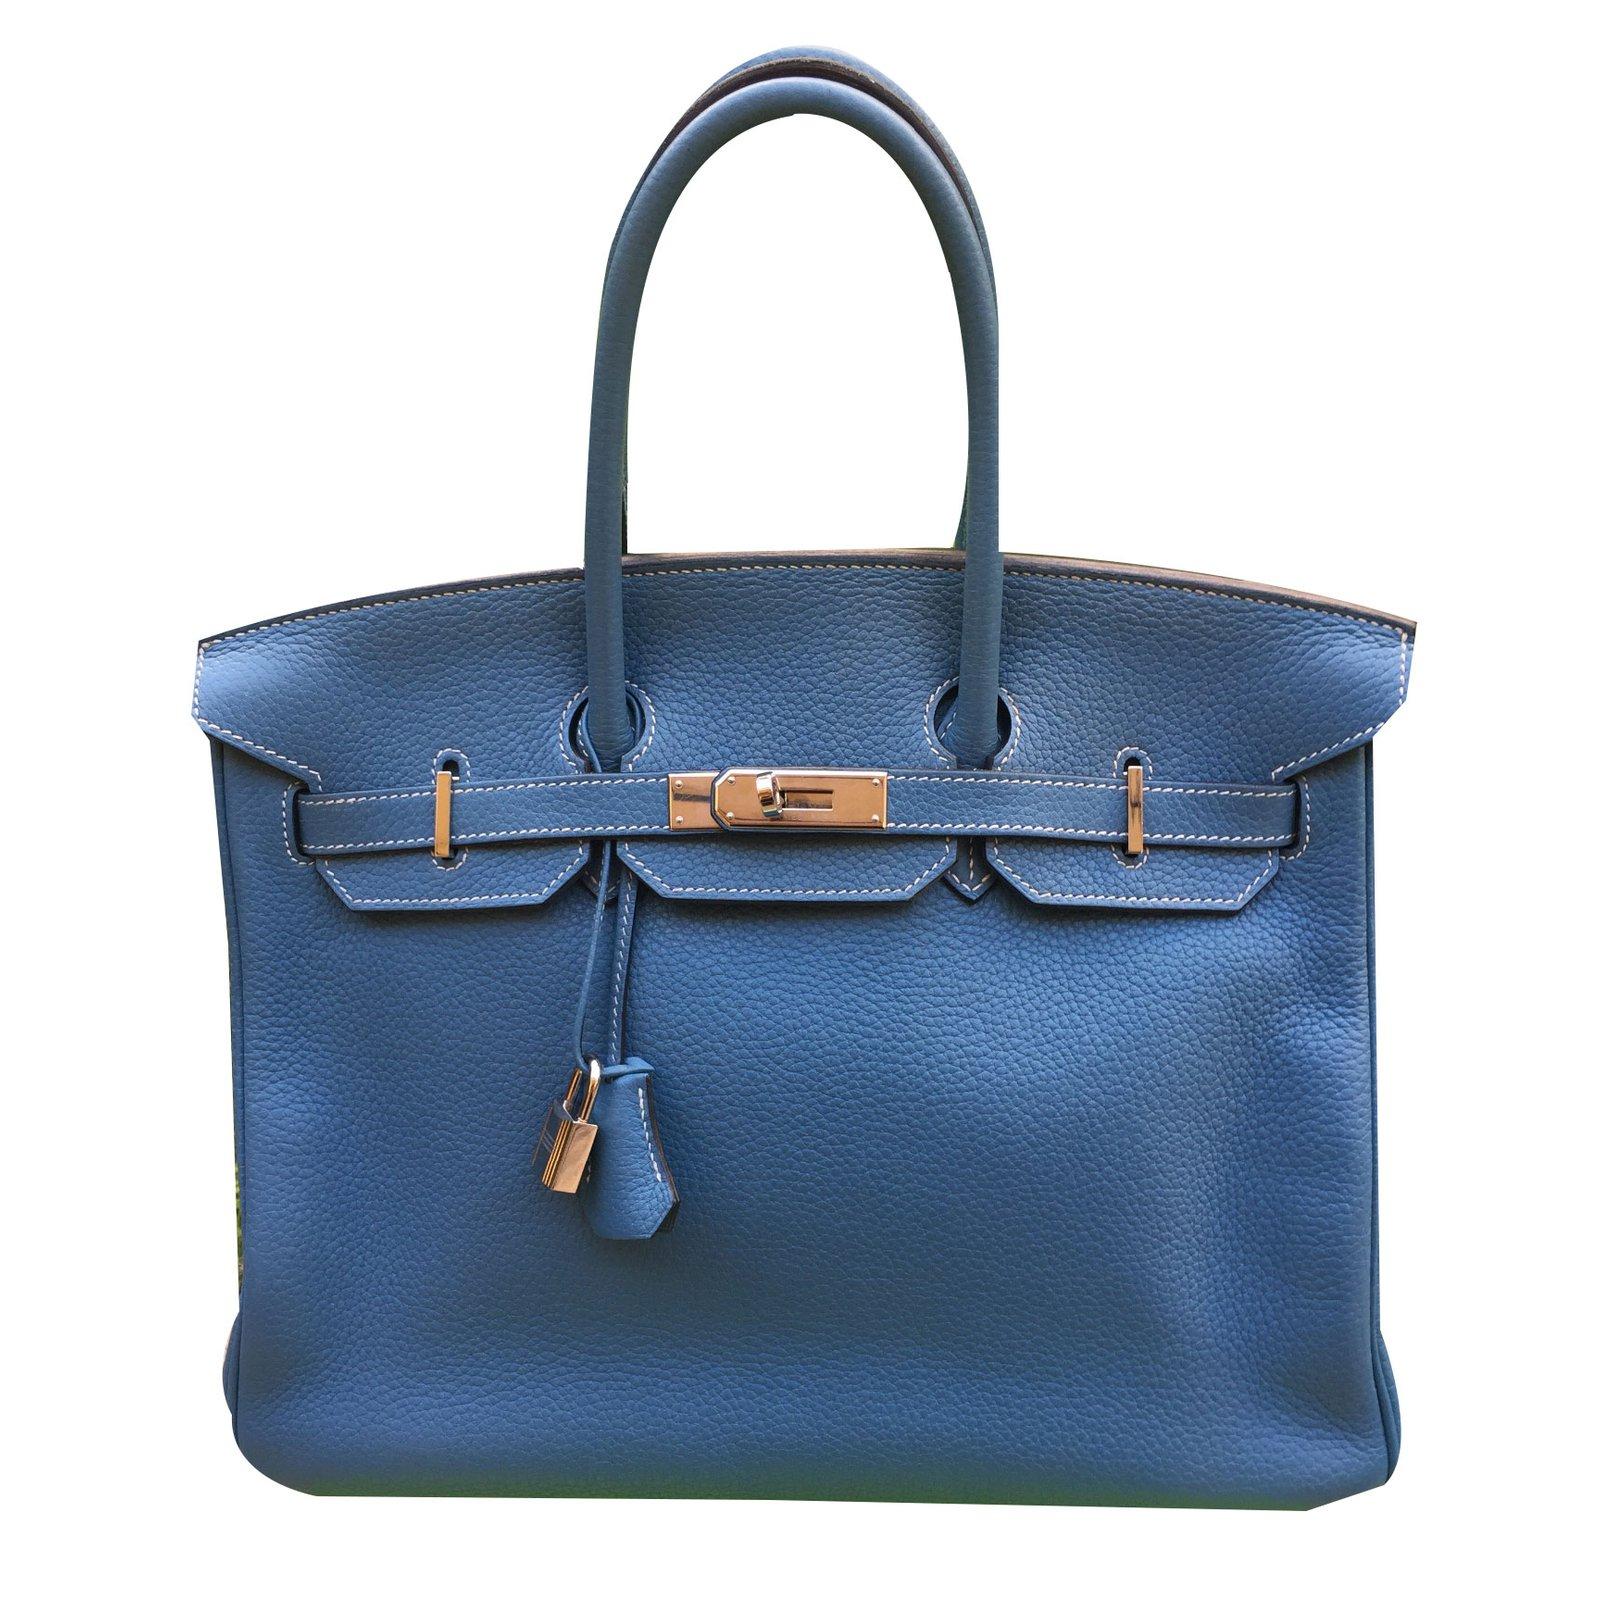 Hermès Birkin 35 Handbags Leather Blue ref.57647 - Joli Closet